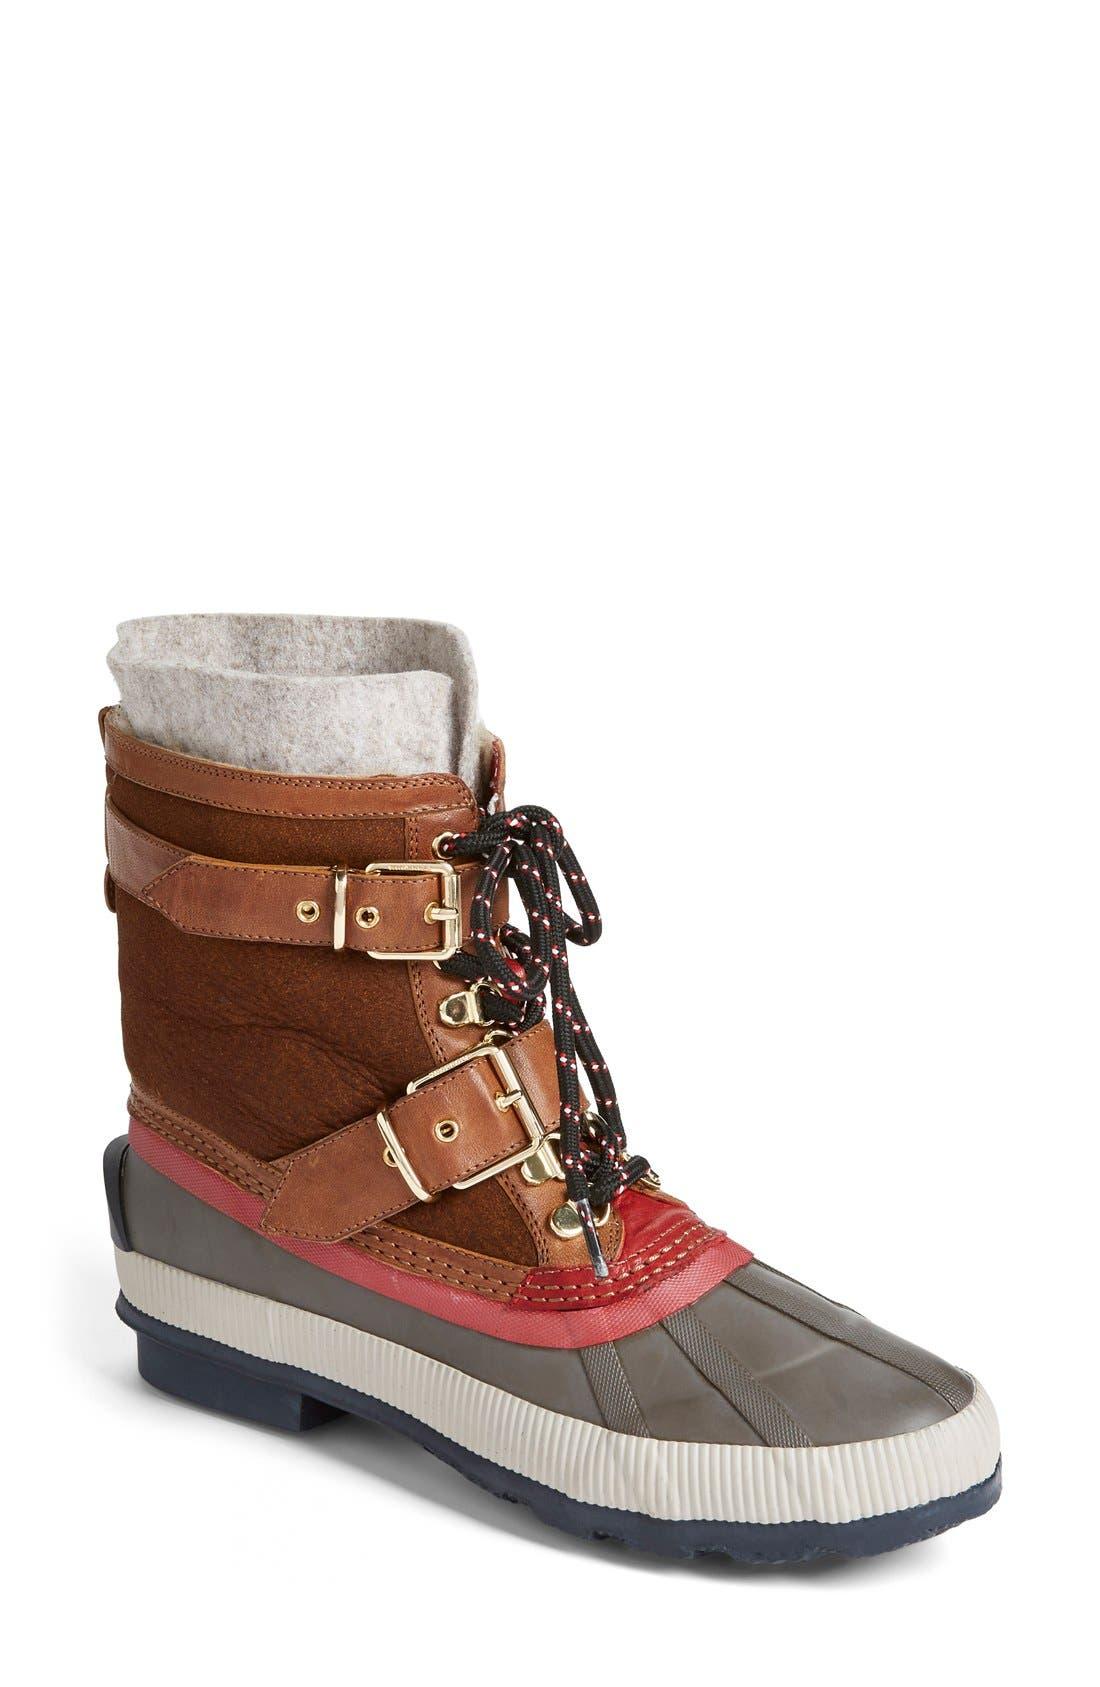 Main Image - Burberry 'Windmere' Boot (Women)